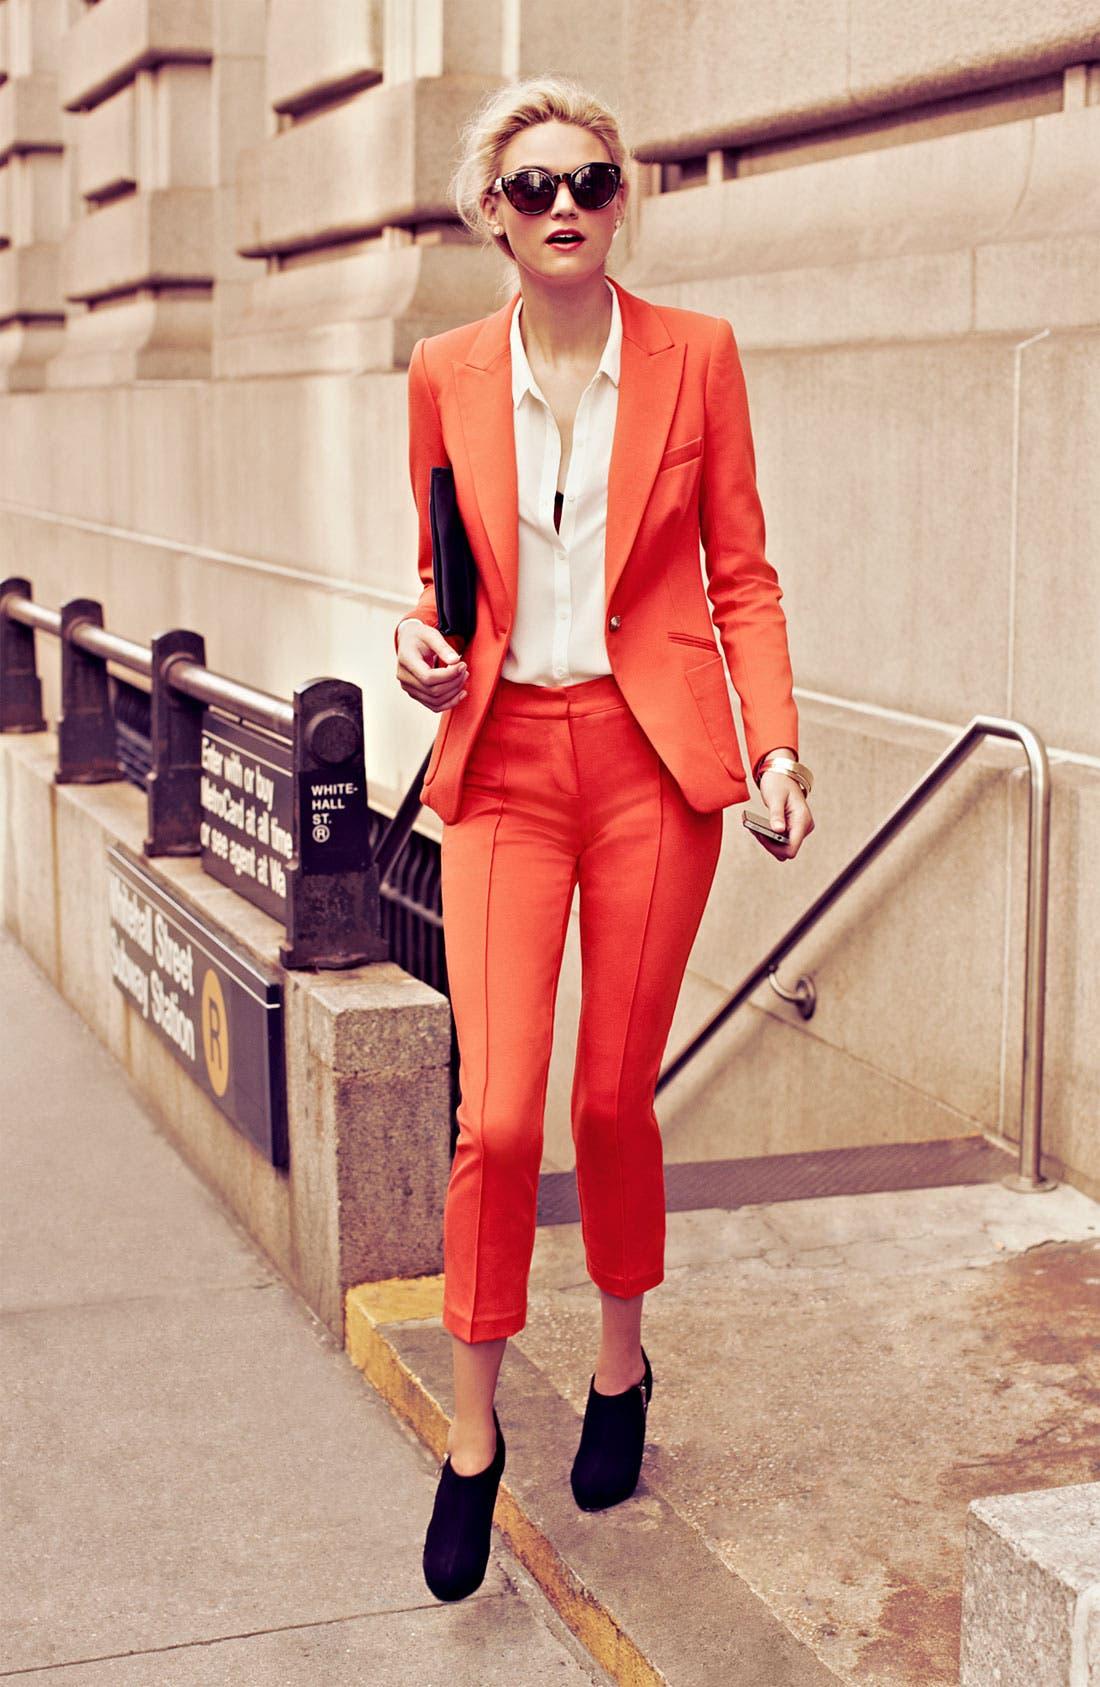 Alternate Image 1 Selected - Trina Turk Jacket, Tank & Pants